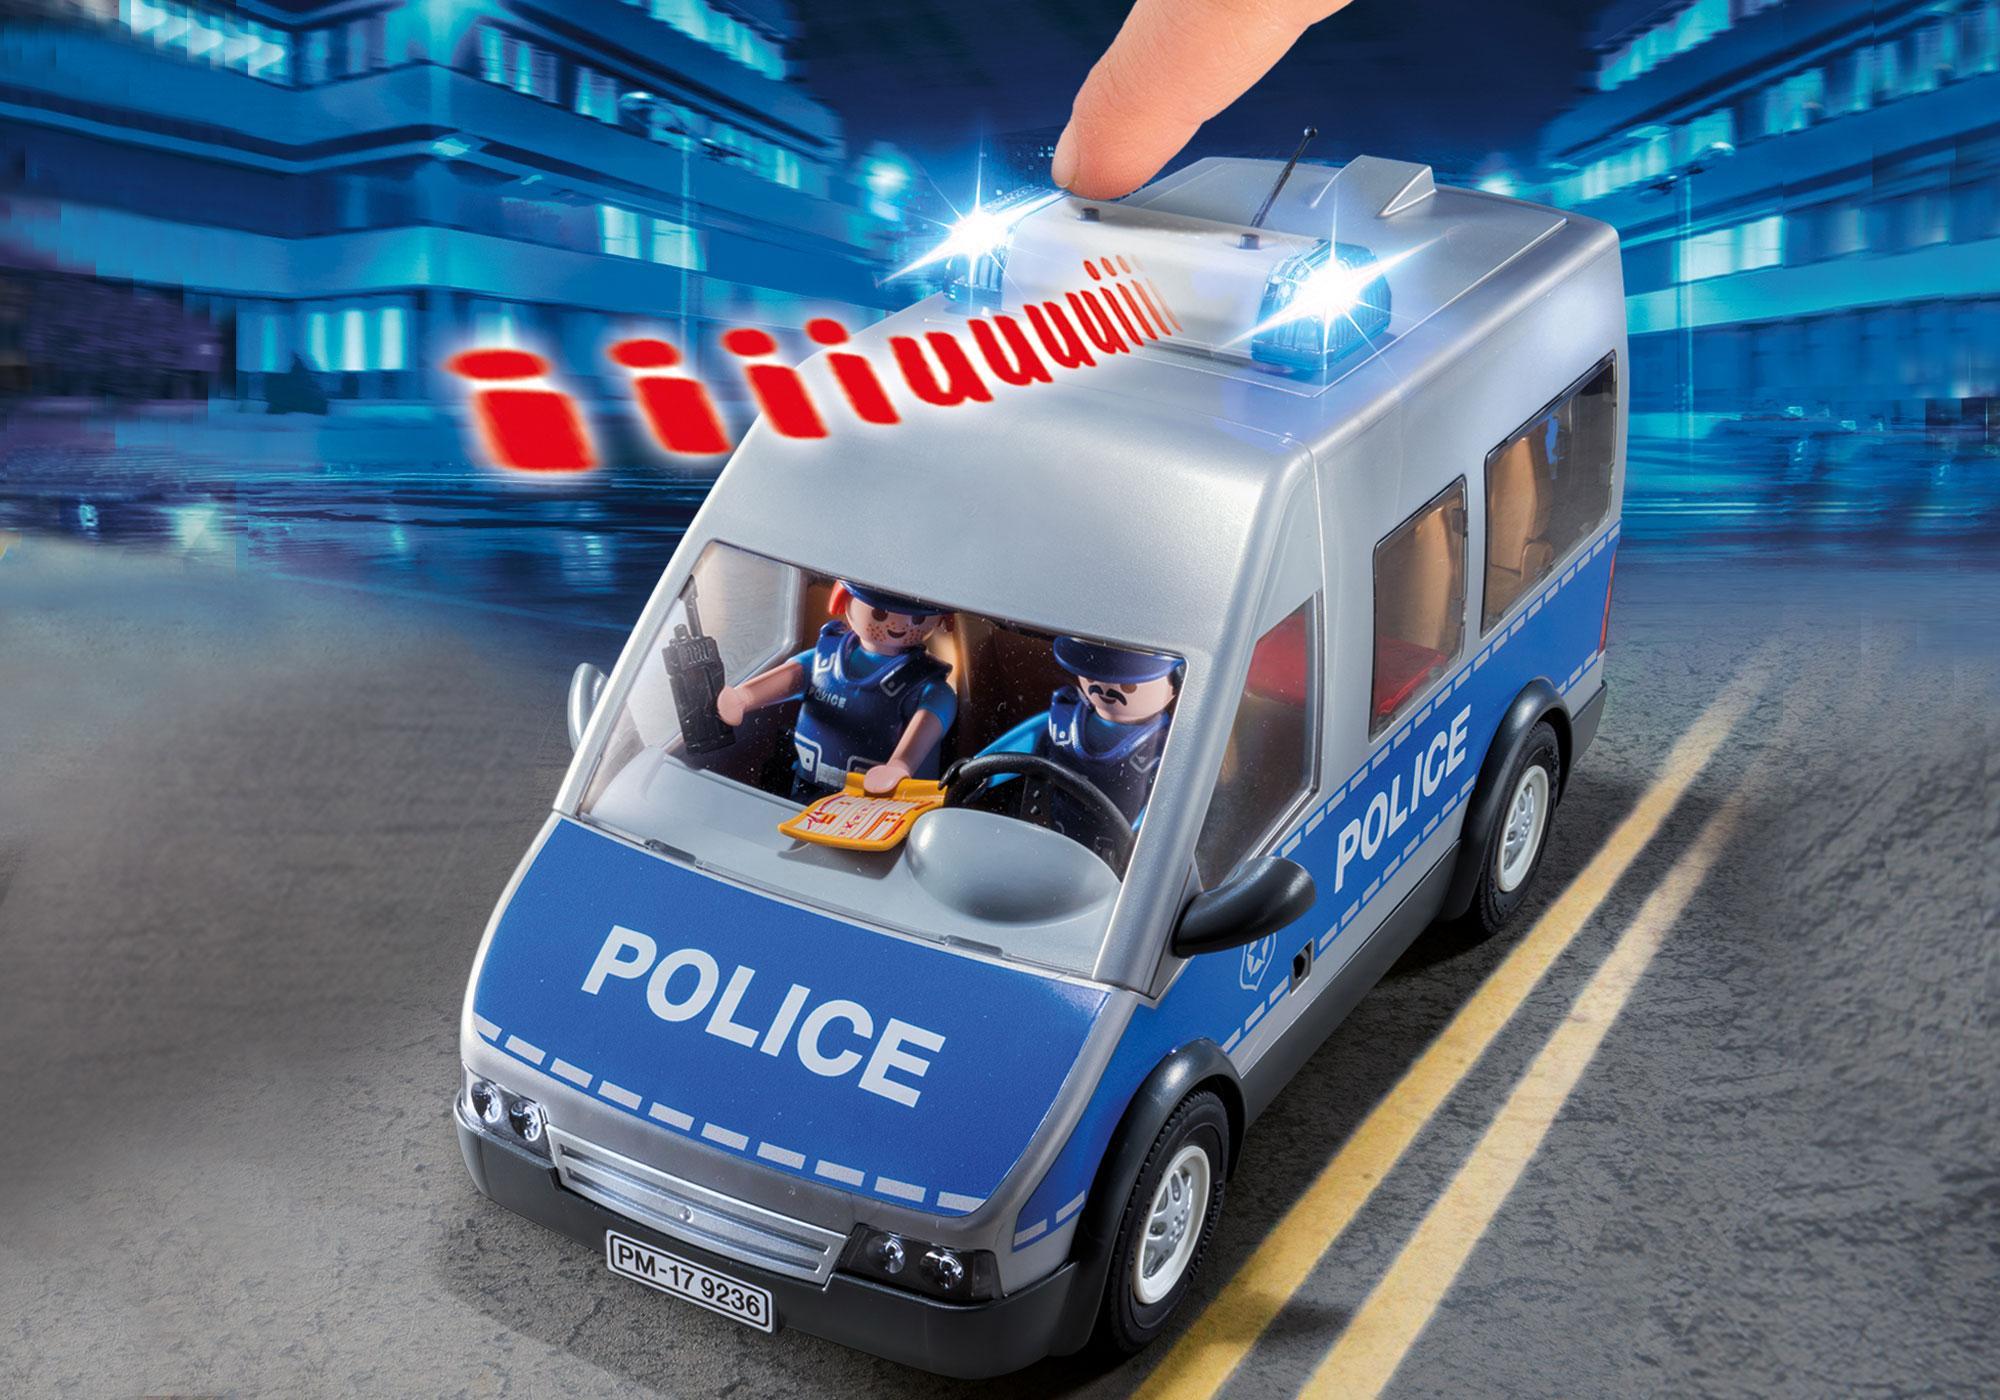 http://media.playmobil.com/i/playmobil/9236_product_extra2/Polizeibus mit Straßensperre